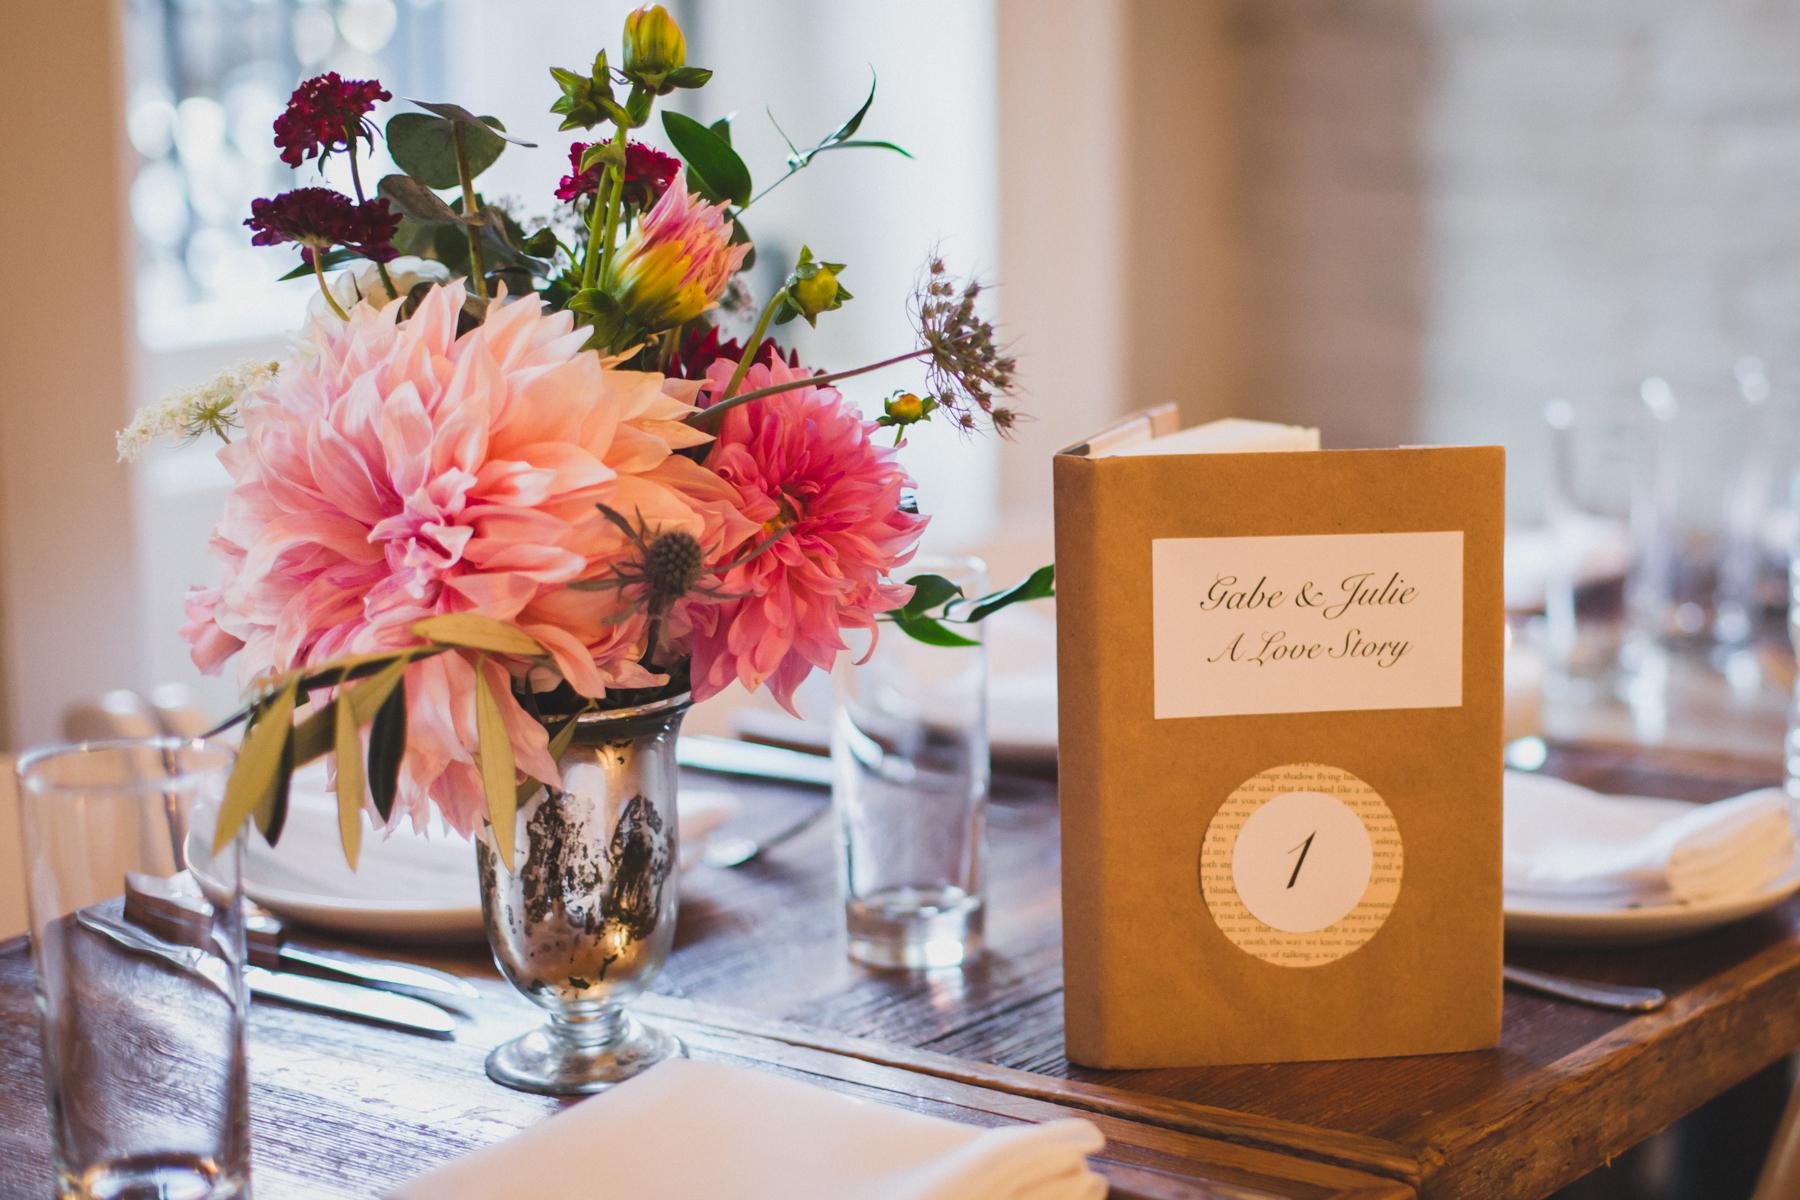 ICI-Restaurant-Fort-Greene-Brooklyn-Intimate-Documentary-Wedding-Photography-Elvira-Kalviste-50.jpg